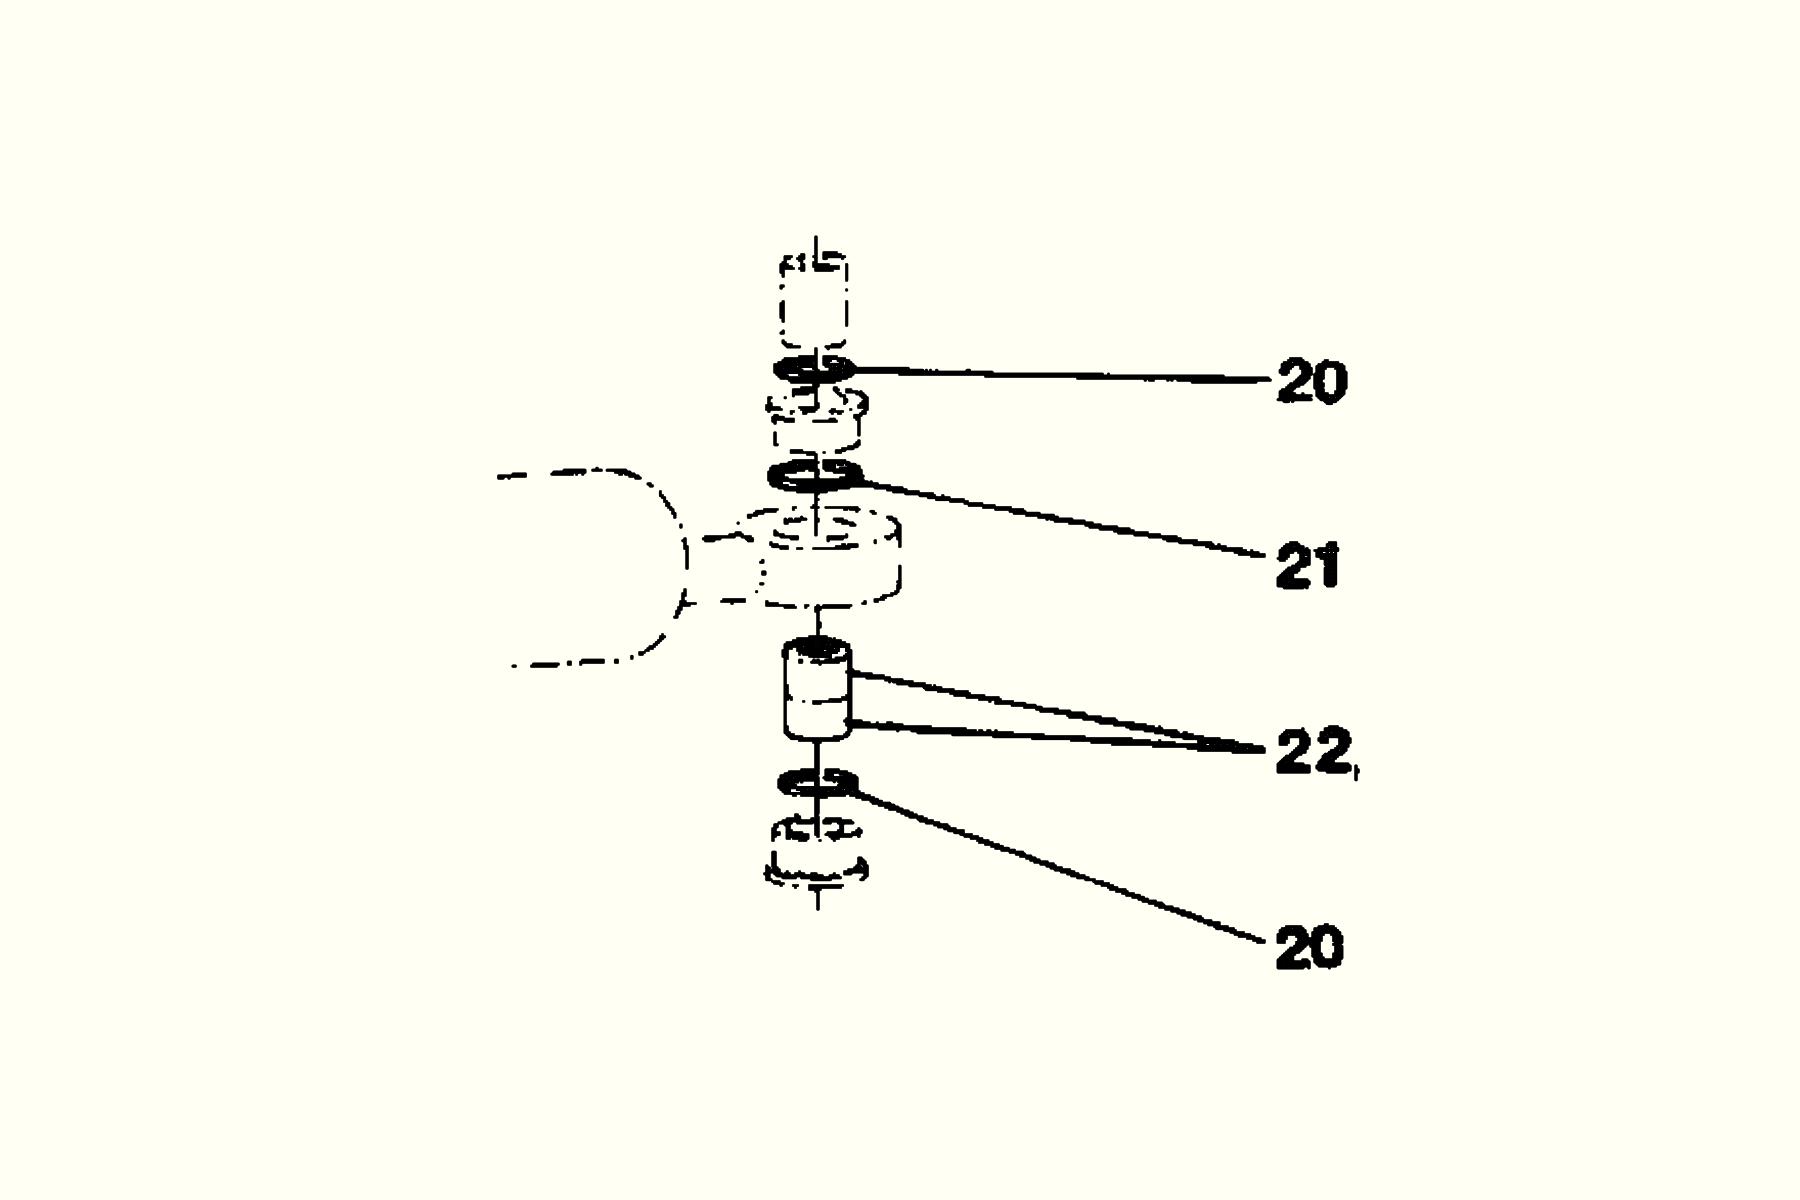 Damping and tilt cylinder end  Repair kit Häggo Nr: 153 6174-806 Price: 373 SEK